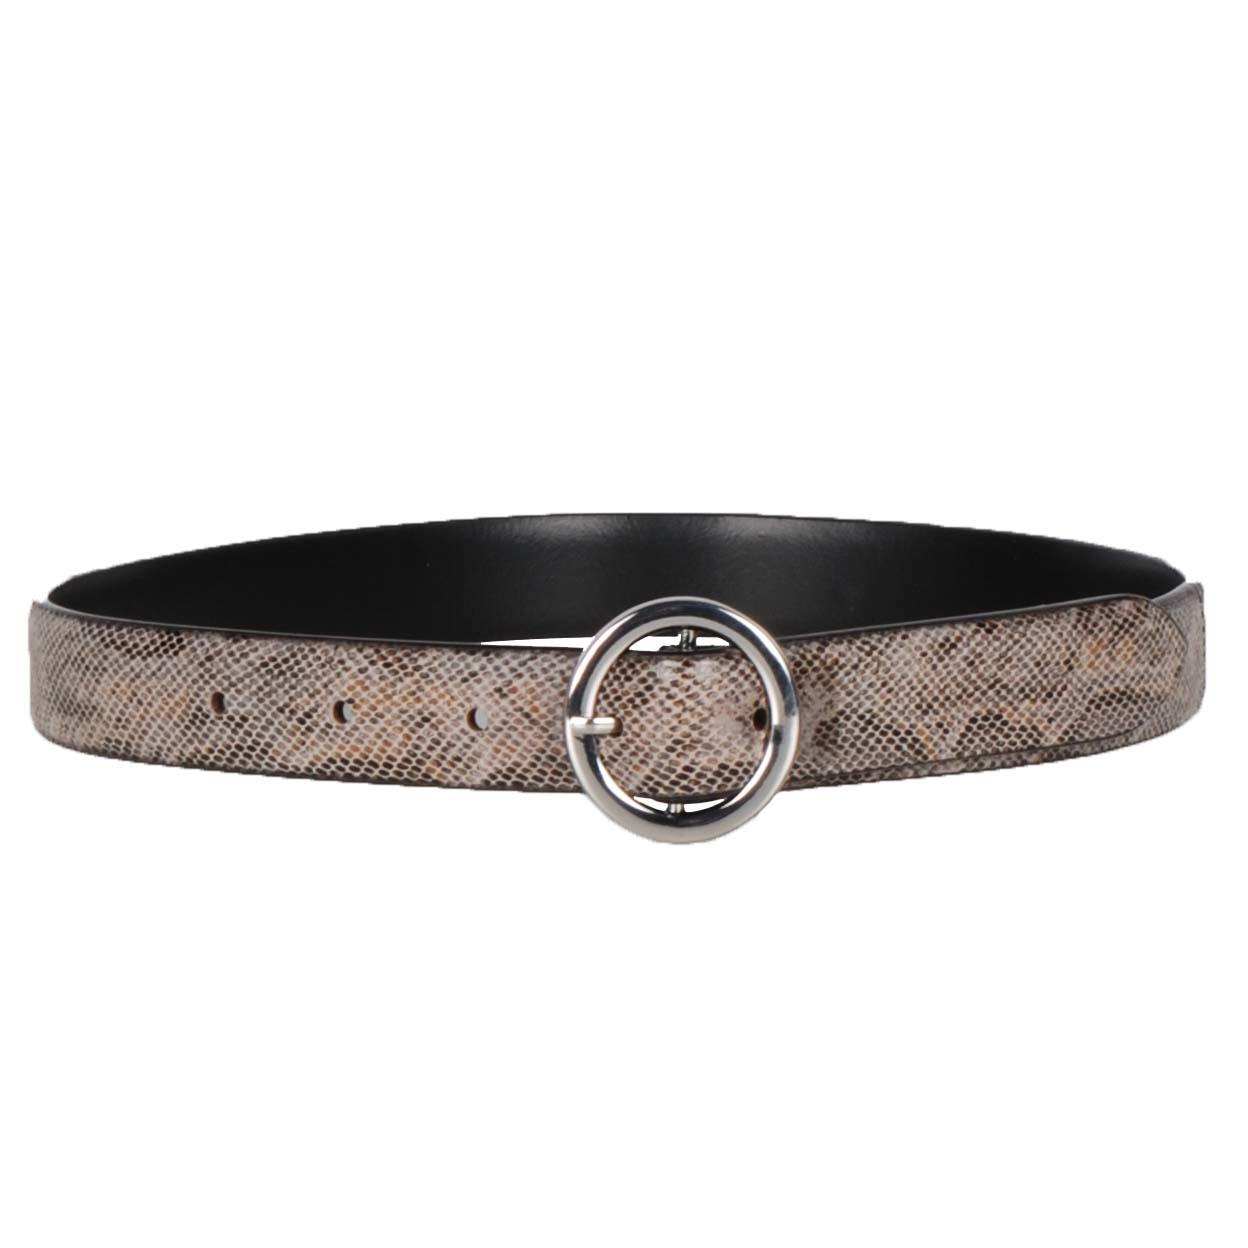 Mondoni Snake riem grijs maat:65